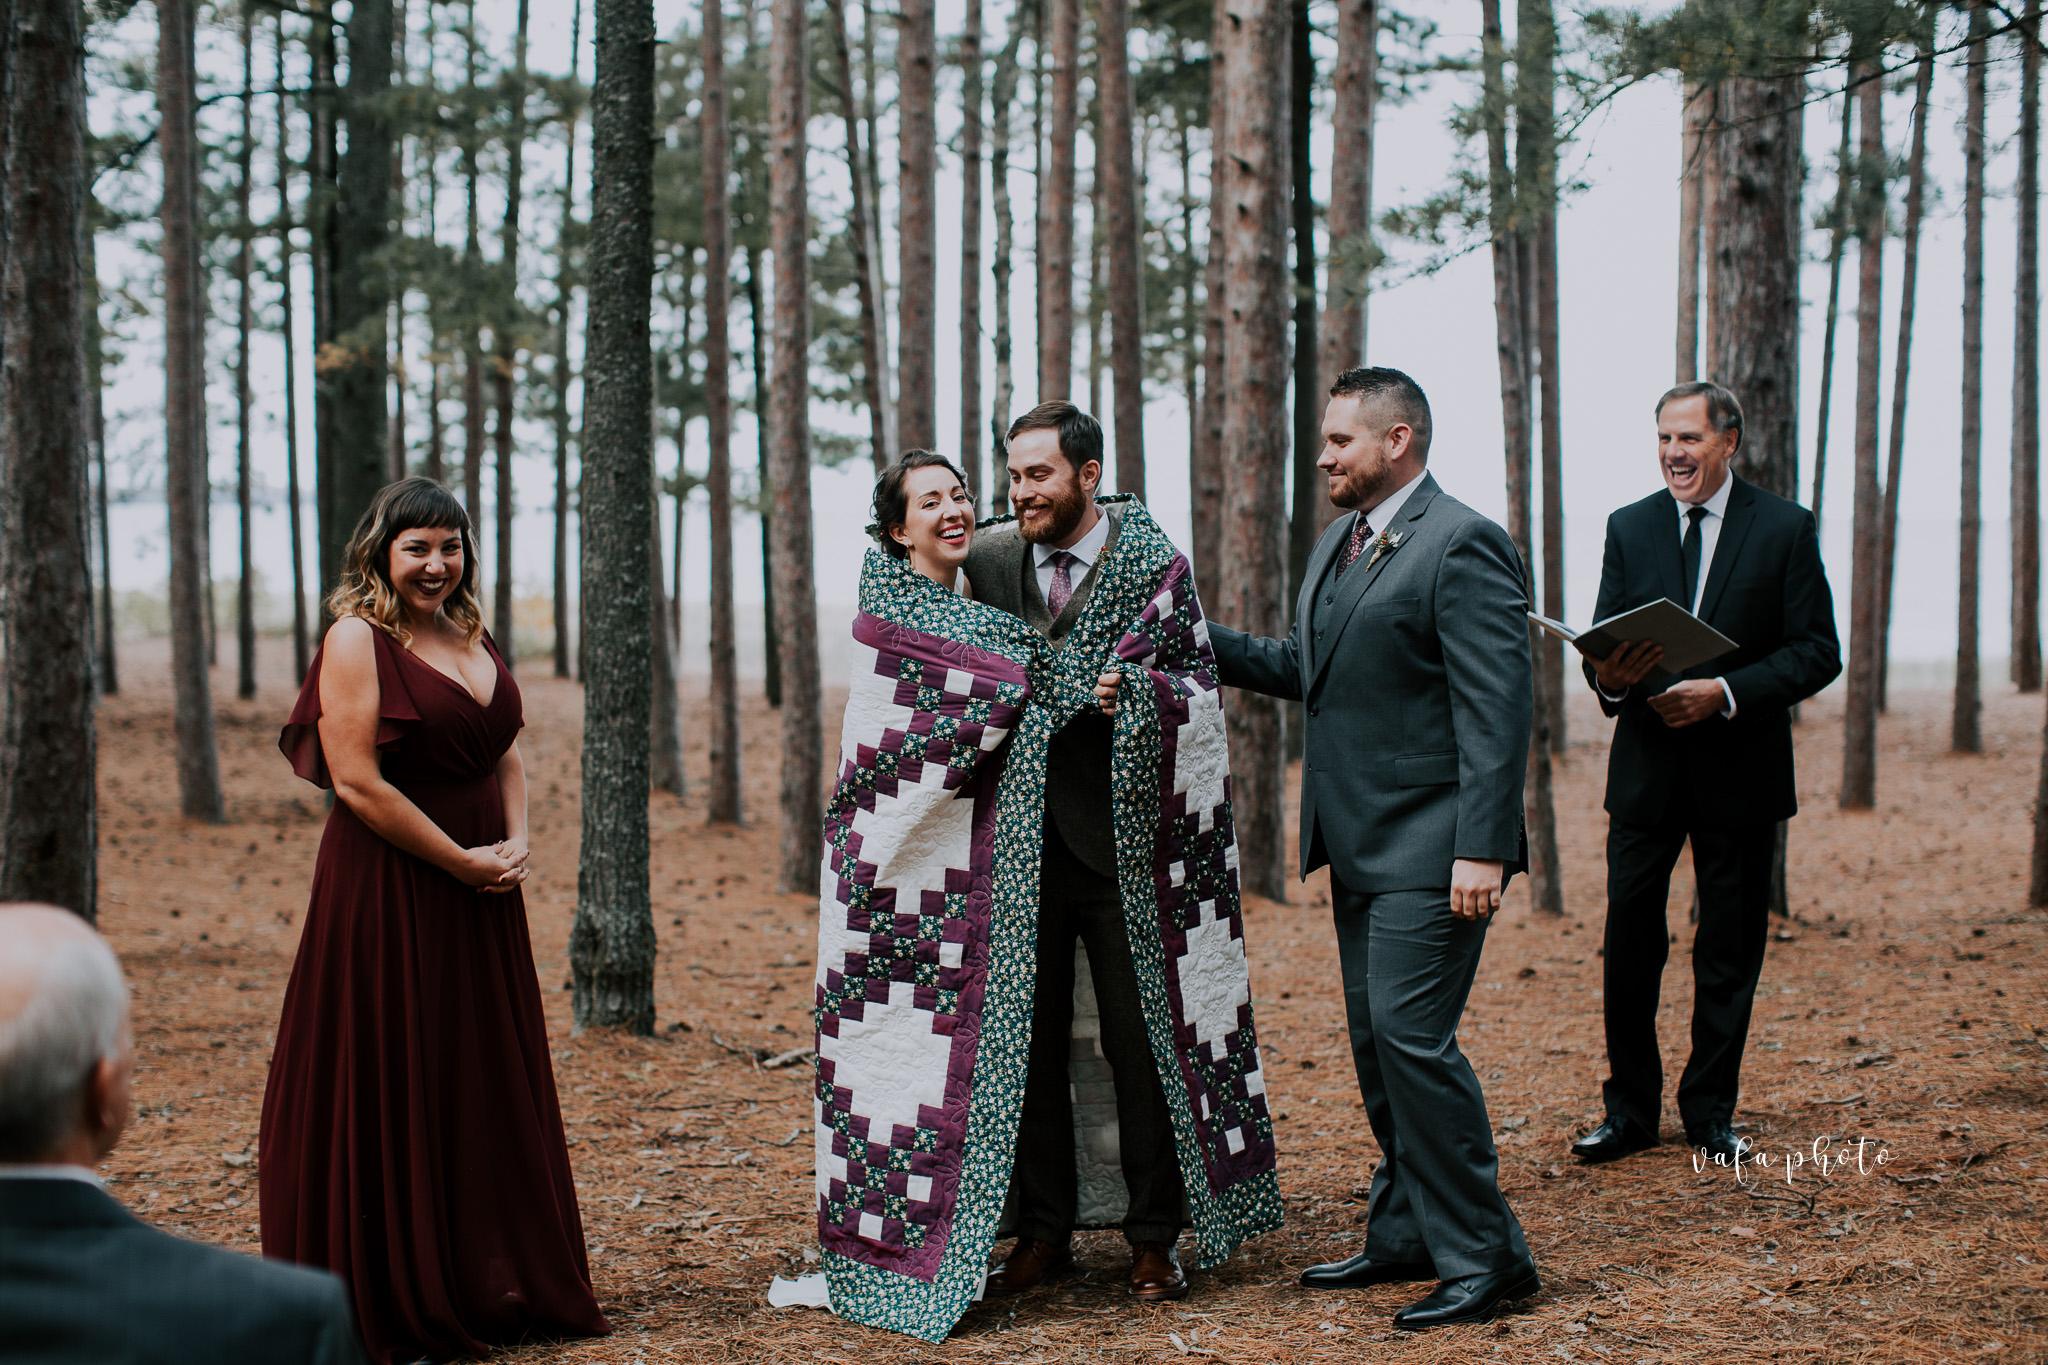 Little-Presque-Isle-Michigan-Wedding-Kim-Kyle-Vafa-Photo-243.jpg